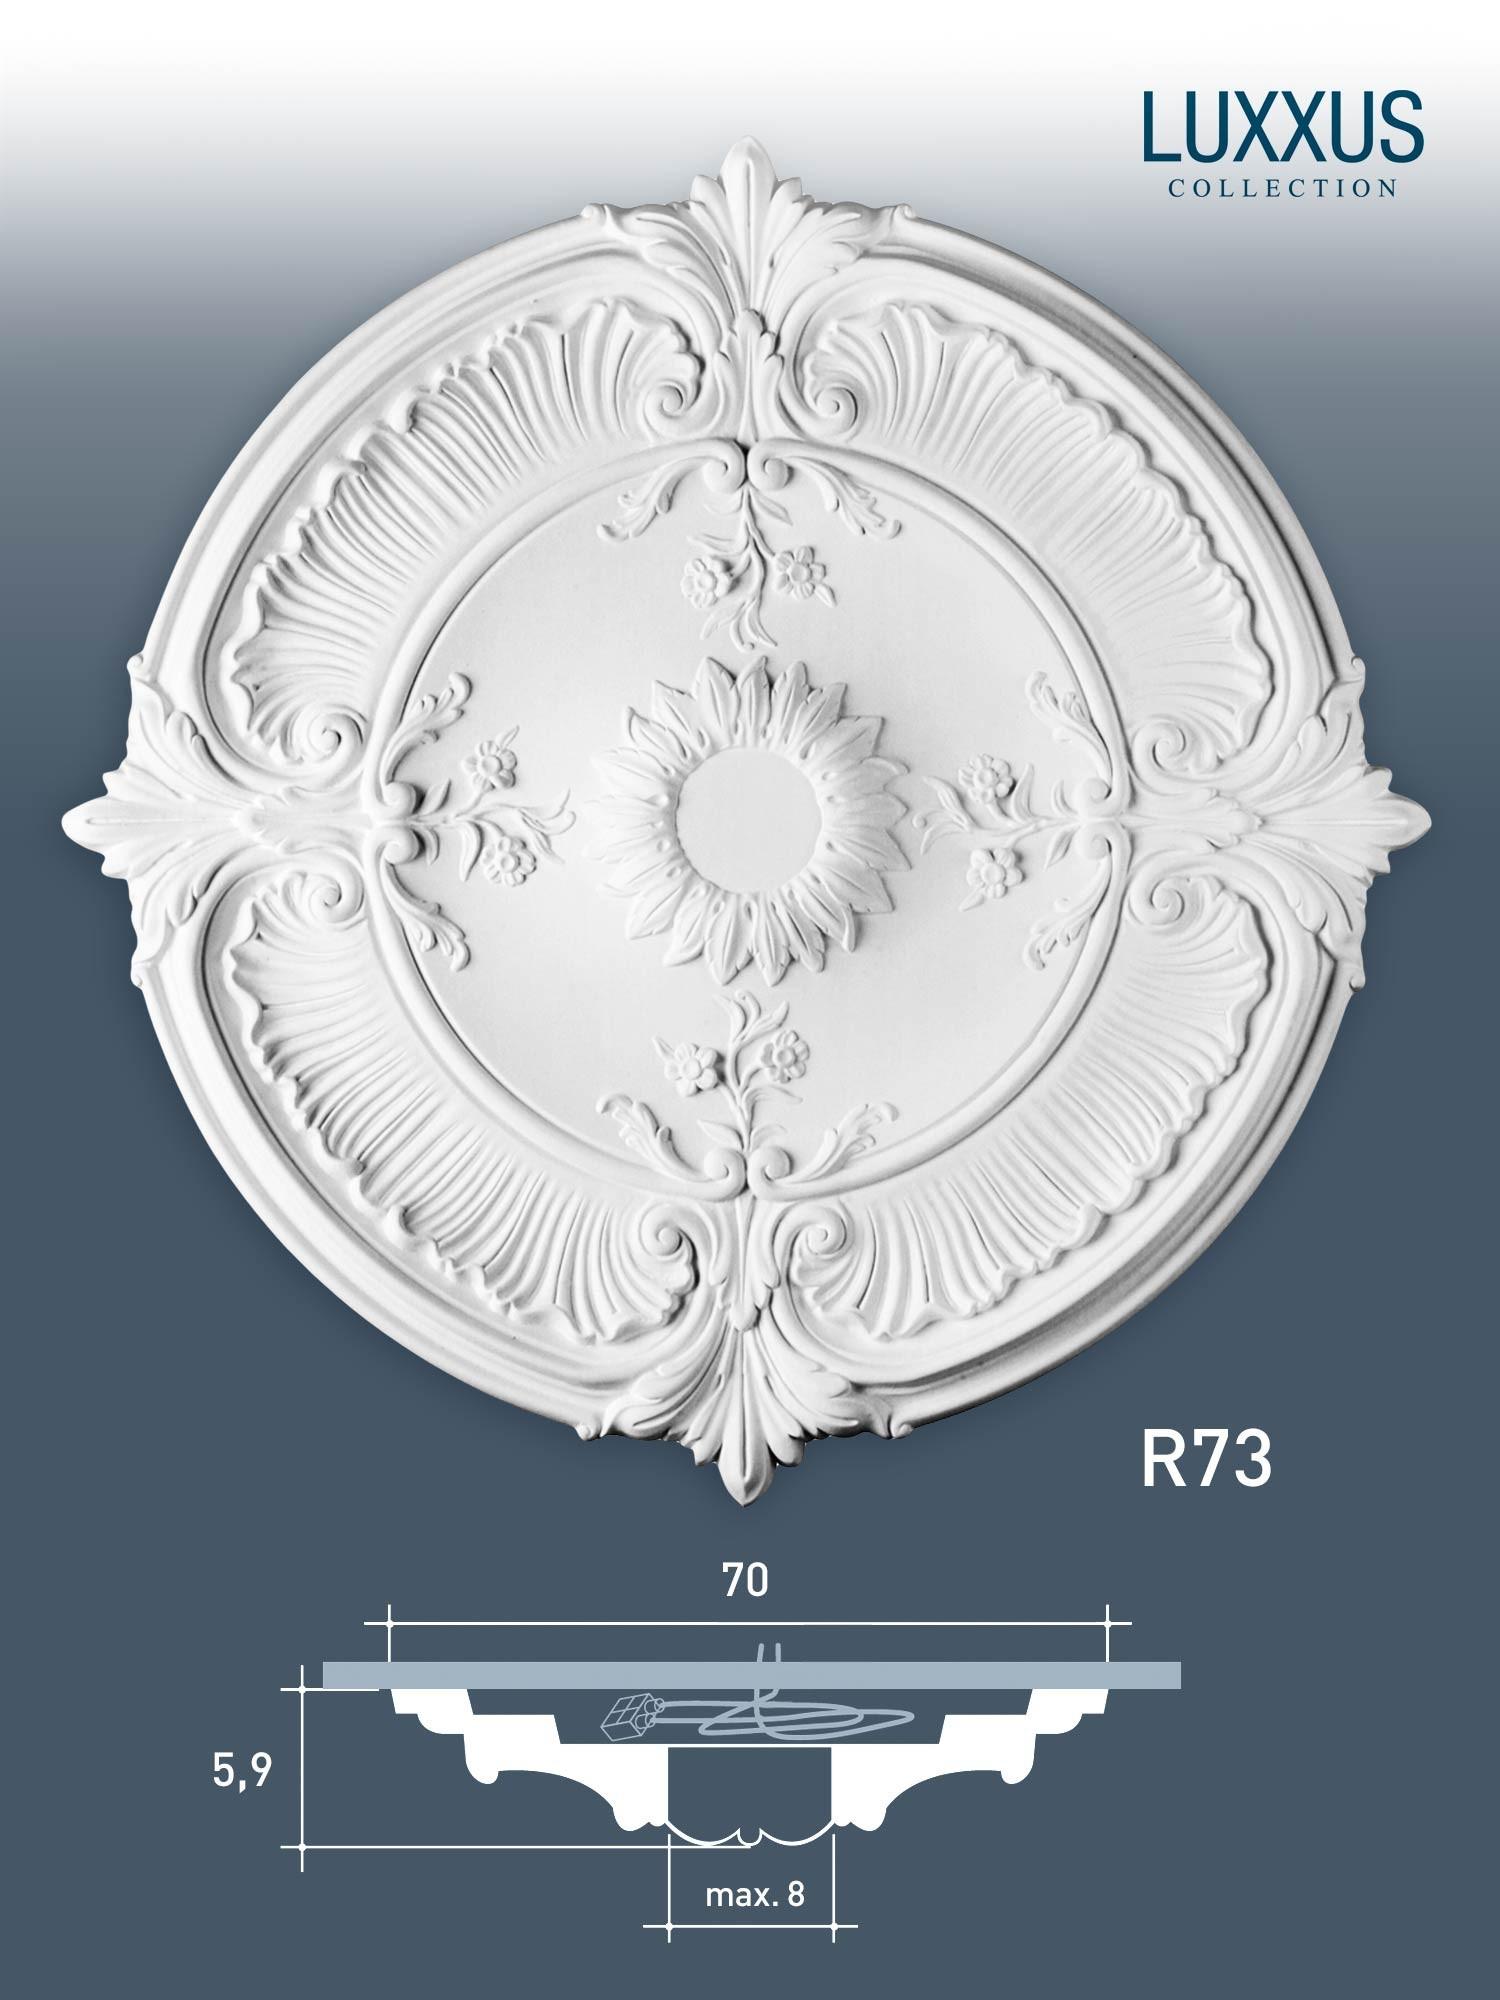 rosace d coration de plafond el ment de stuc orac decor r73 luxxus el ment d coratif blanc 70. Black Bedroom Furniture Sets. Home Design Ideas